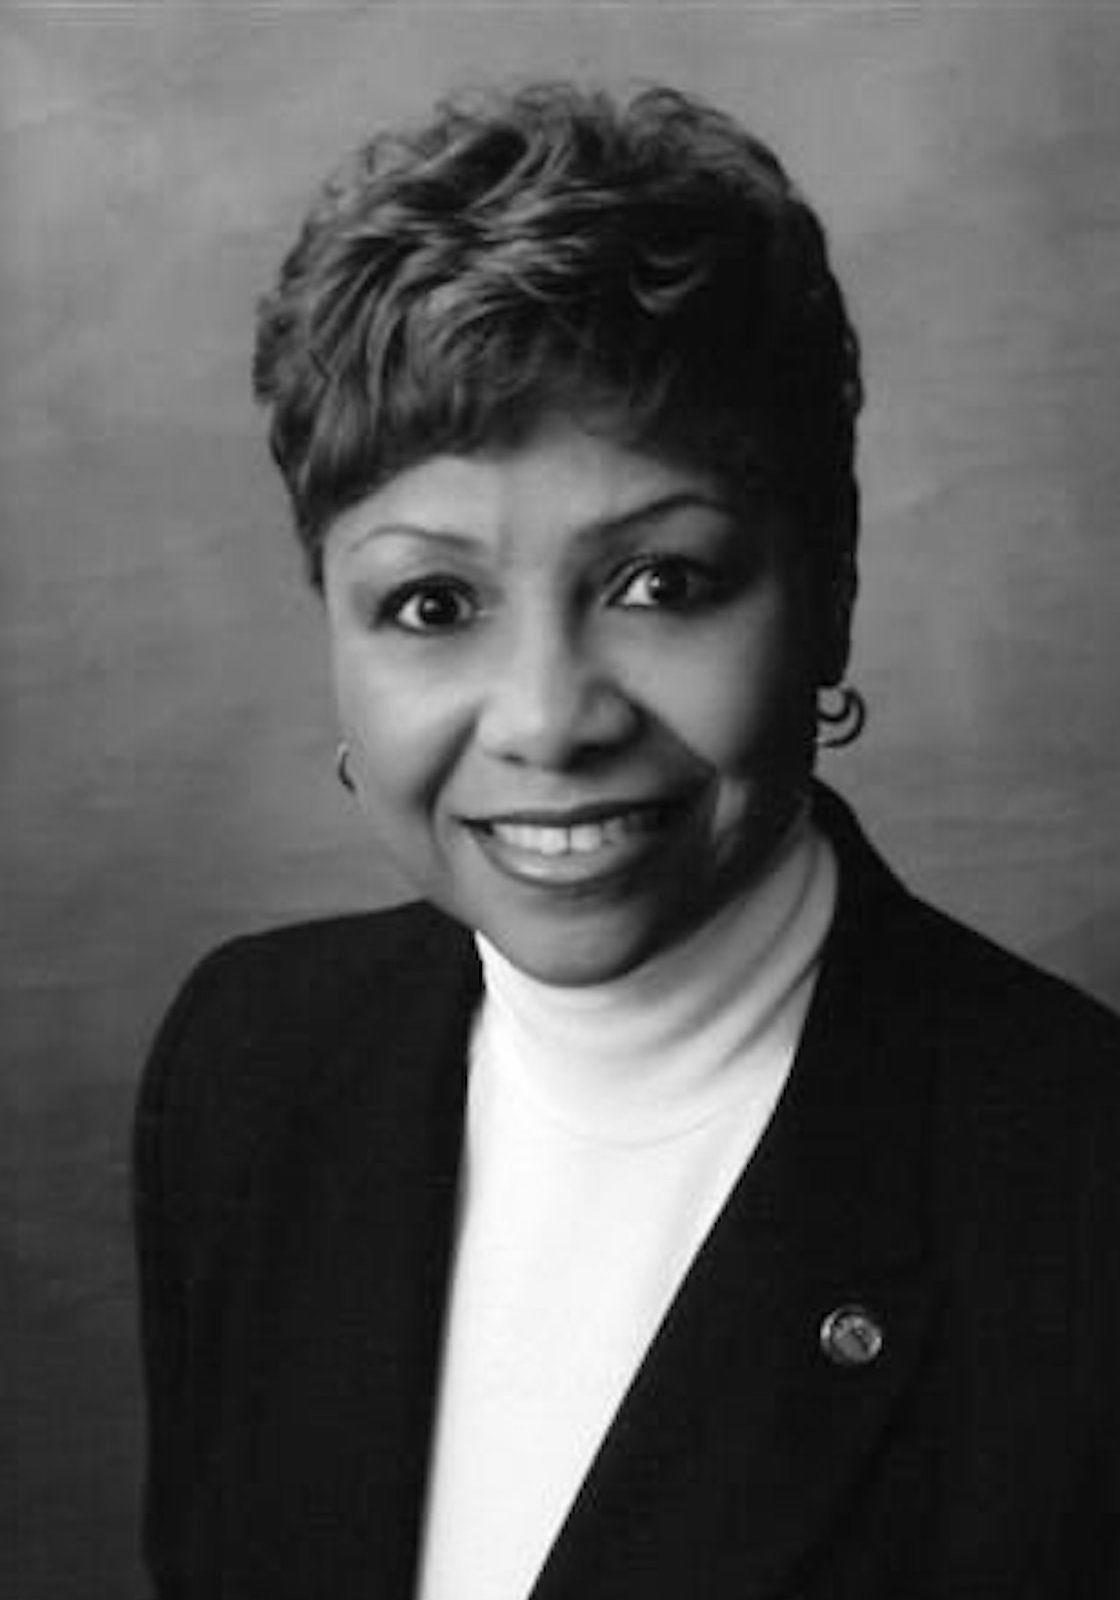 Linda Coleman-Madison, Willoughby Avenue, The Five Fifths, KOLUMN Magazine, KOLUMN, African American Politics, Black in Politics